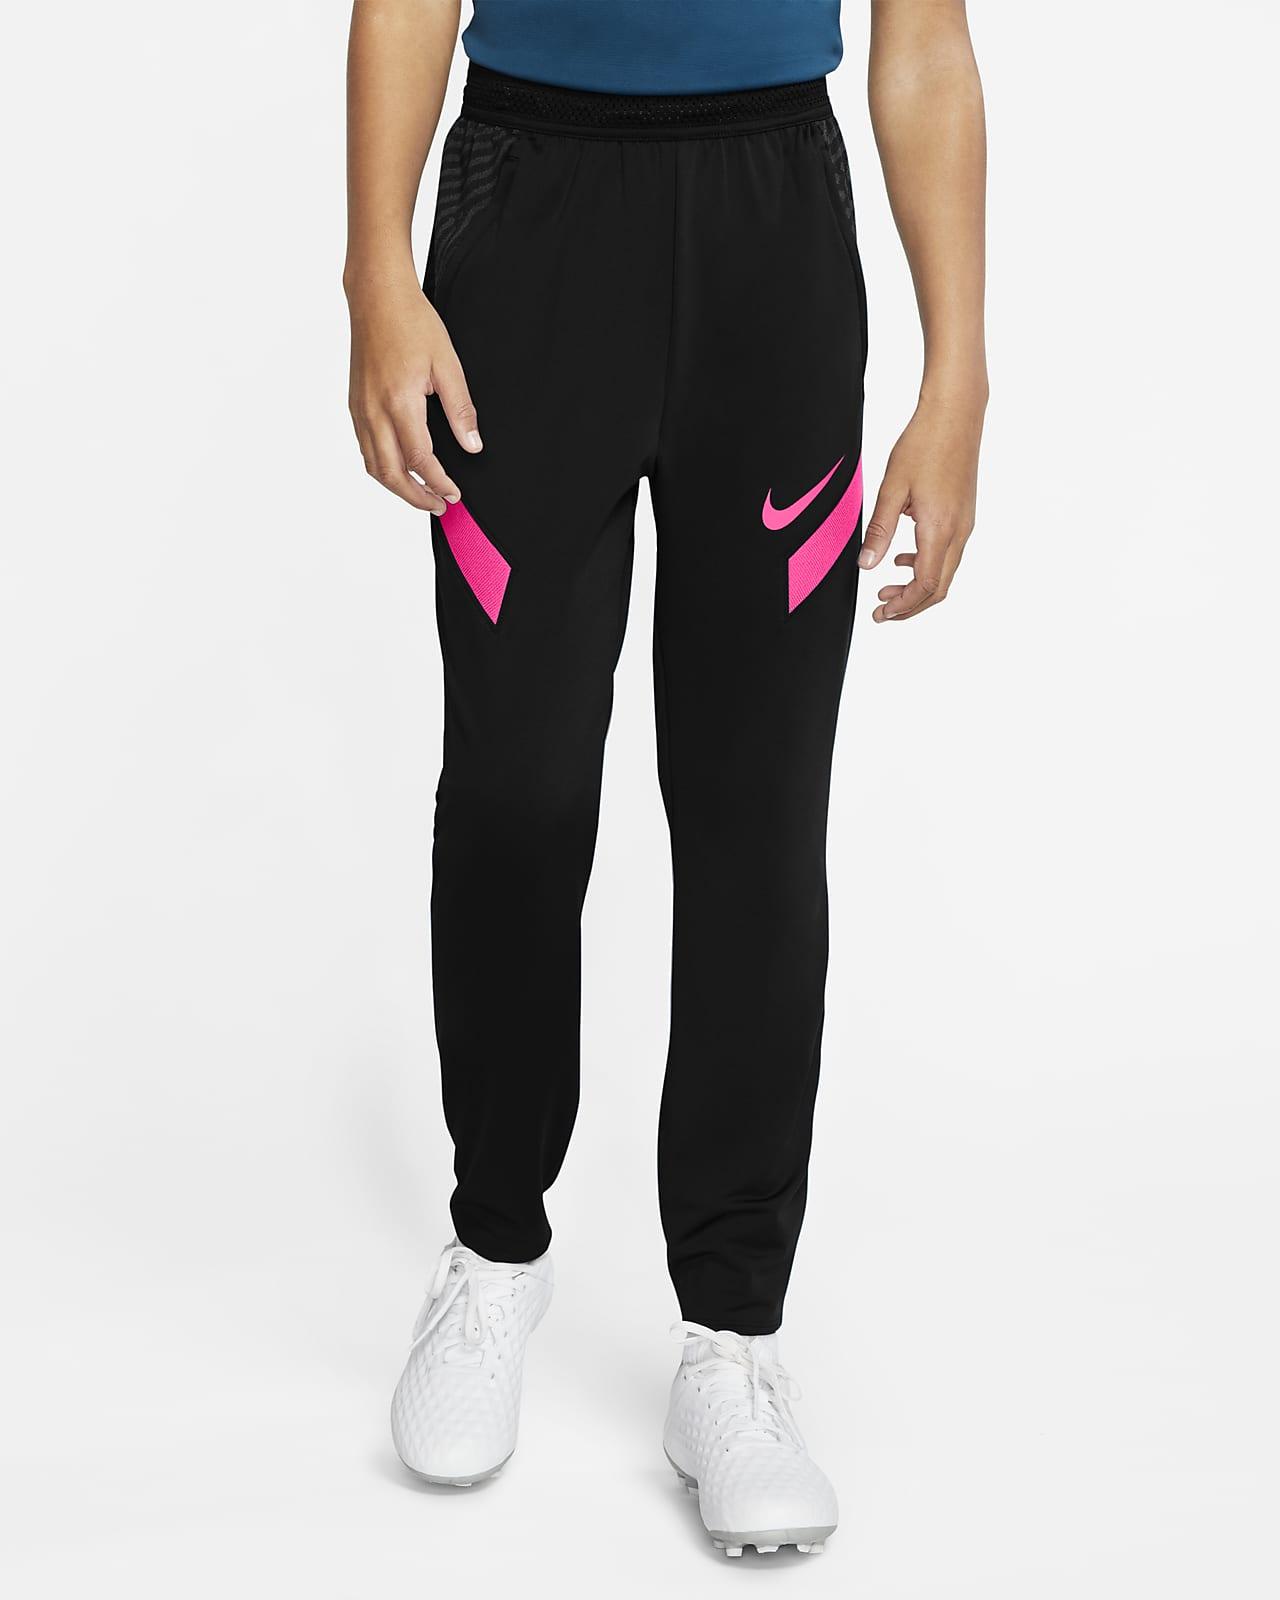 Pantalones de fútbol para niños talla grande Nike Dri-FIT Strike